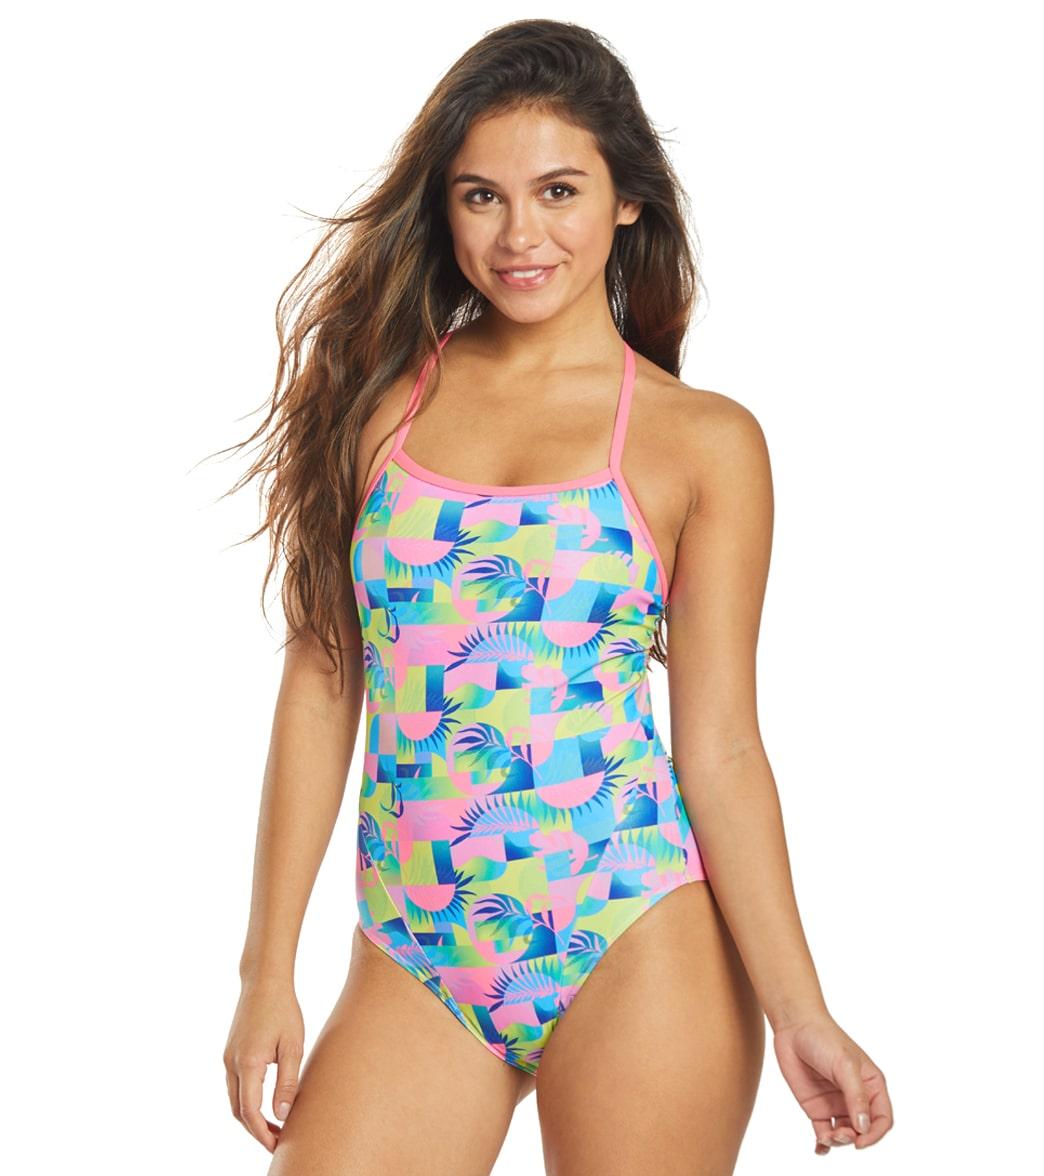 Funkita Women's Sunkissed Single Strap One Piece Swimsuit